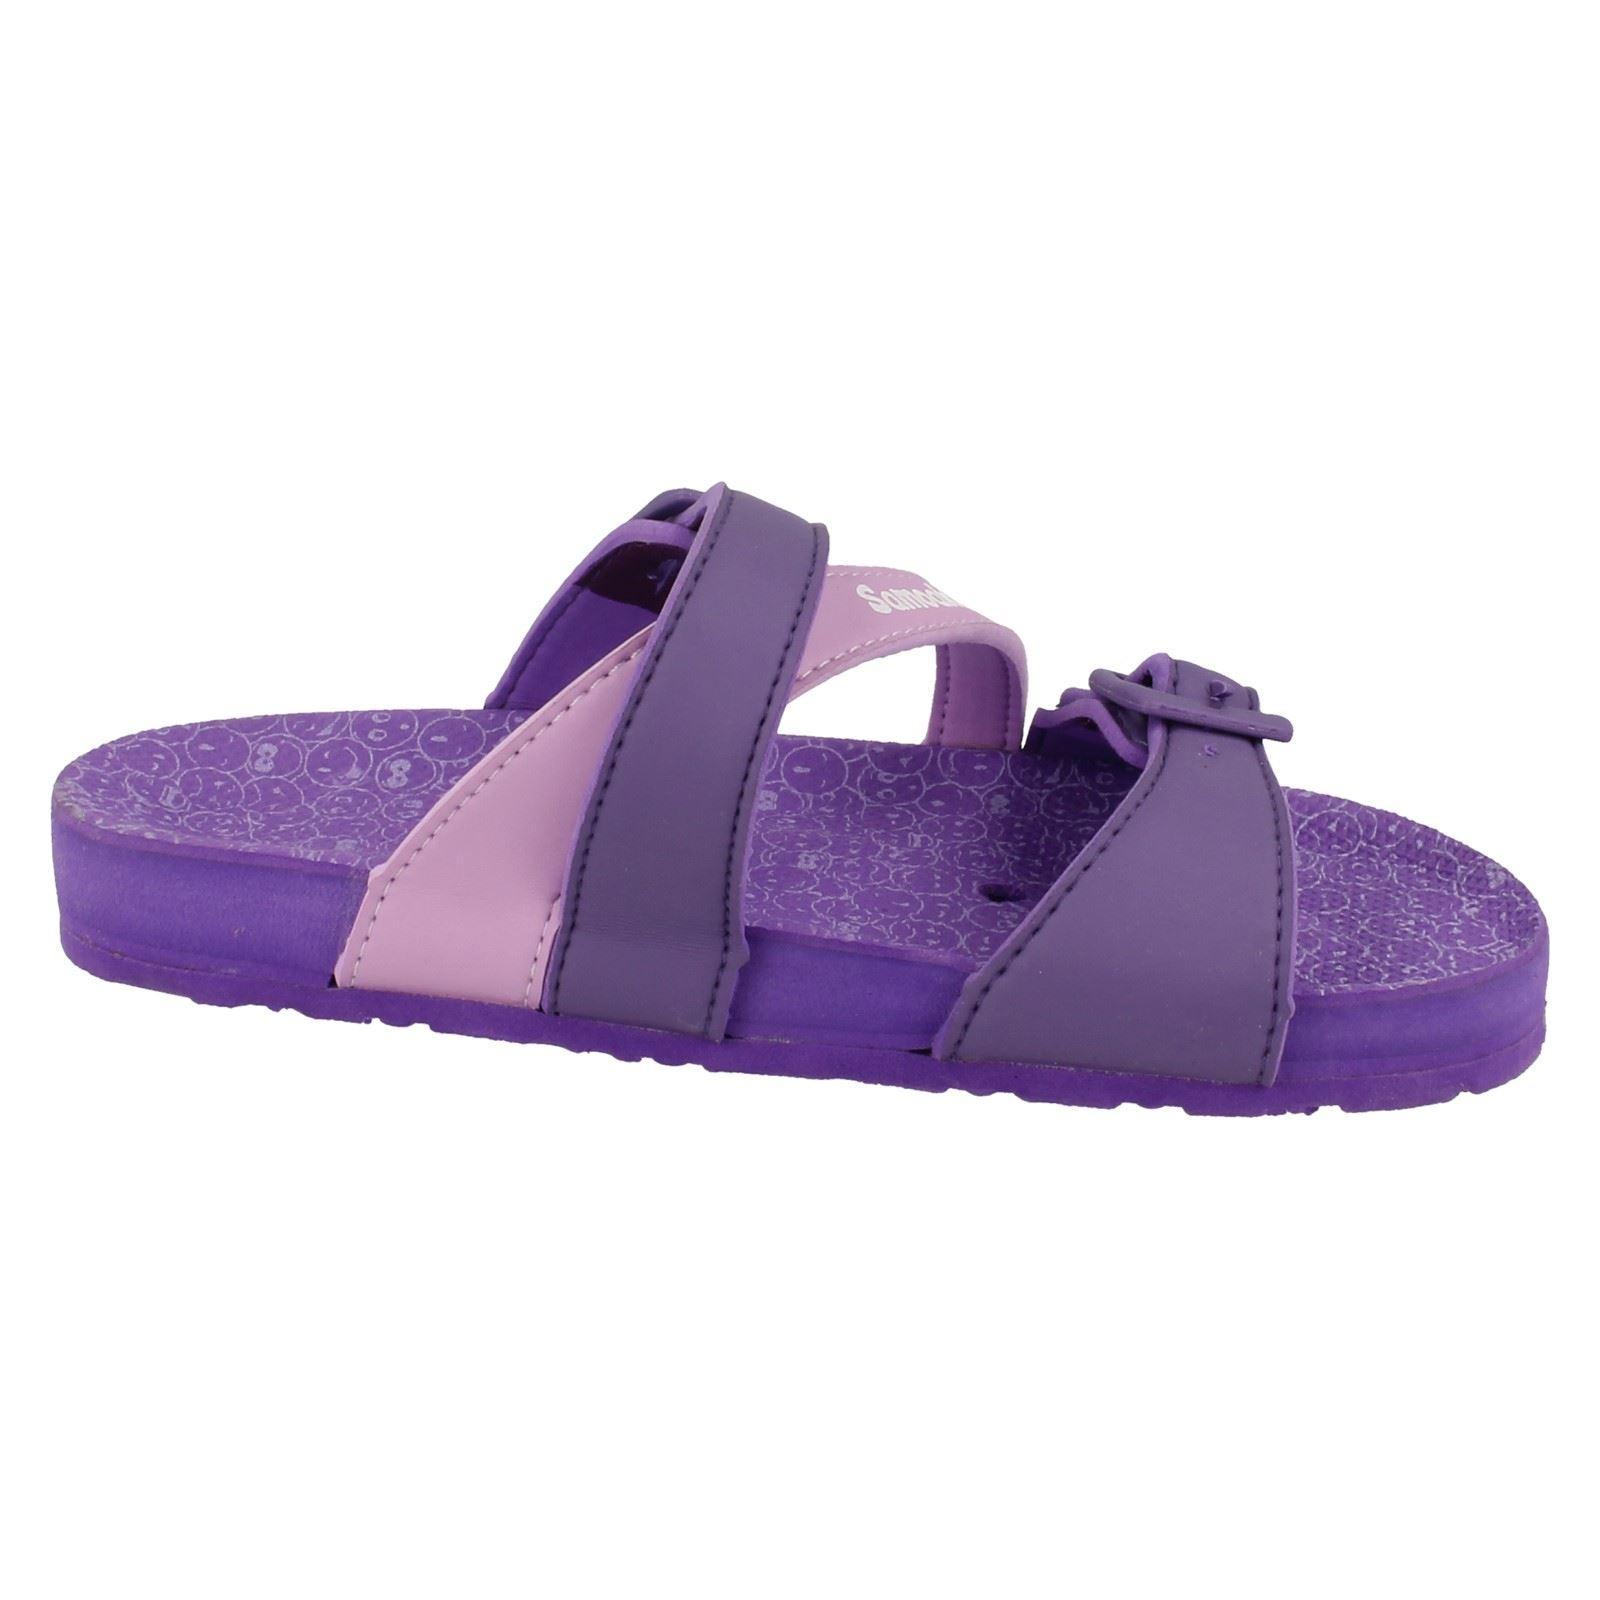 Girls Samoa Synthetic Sandals - Cherry ~ N